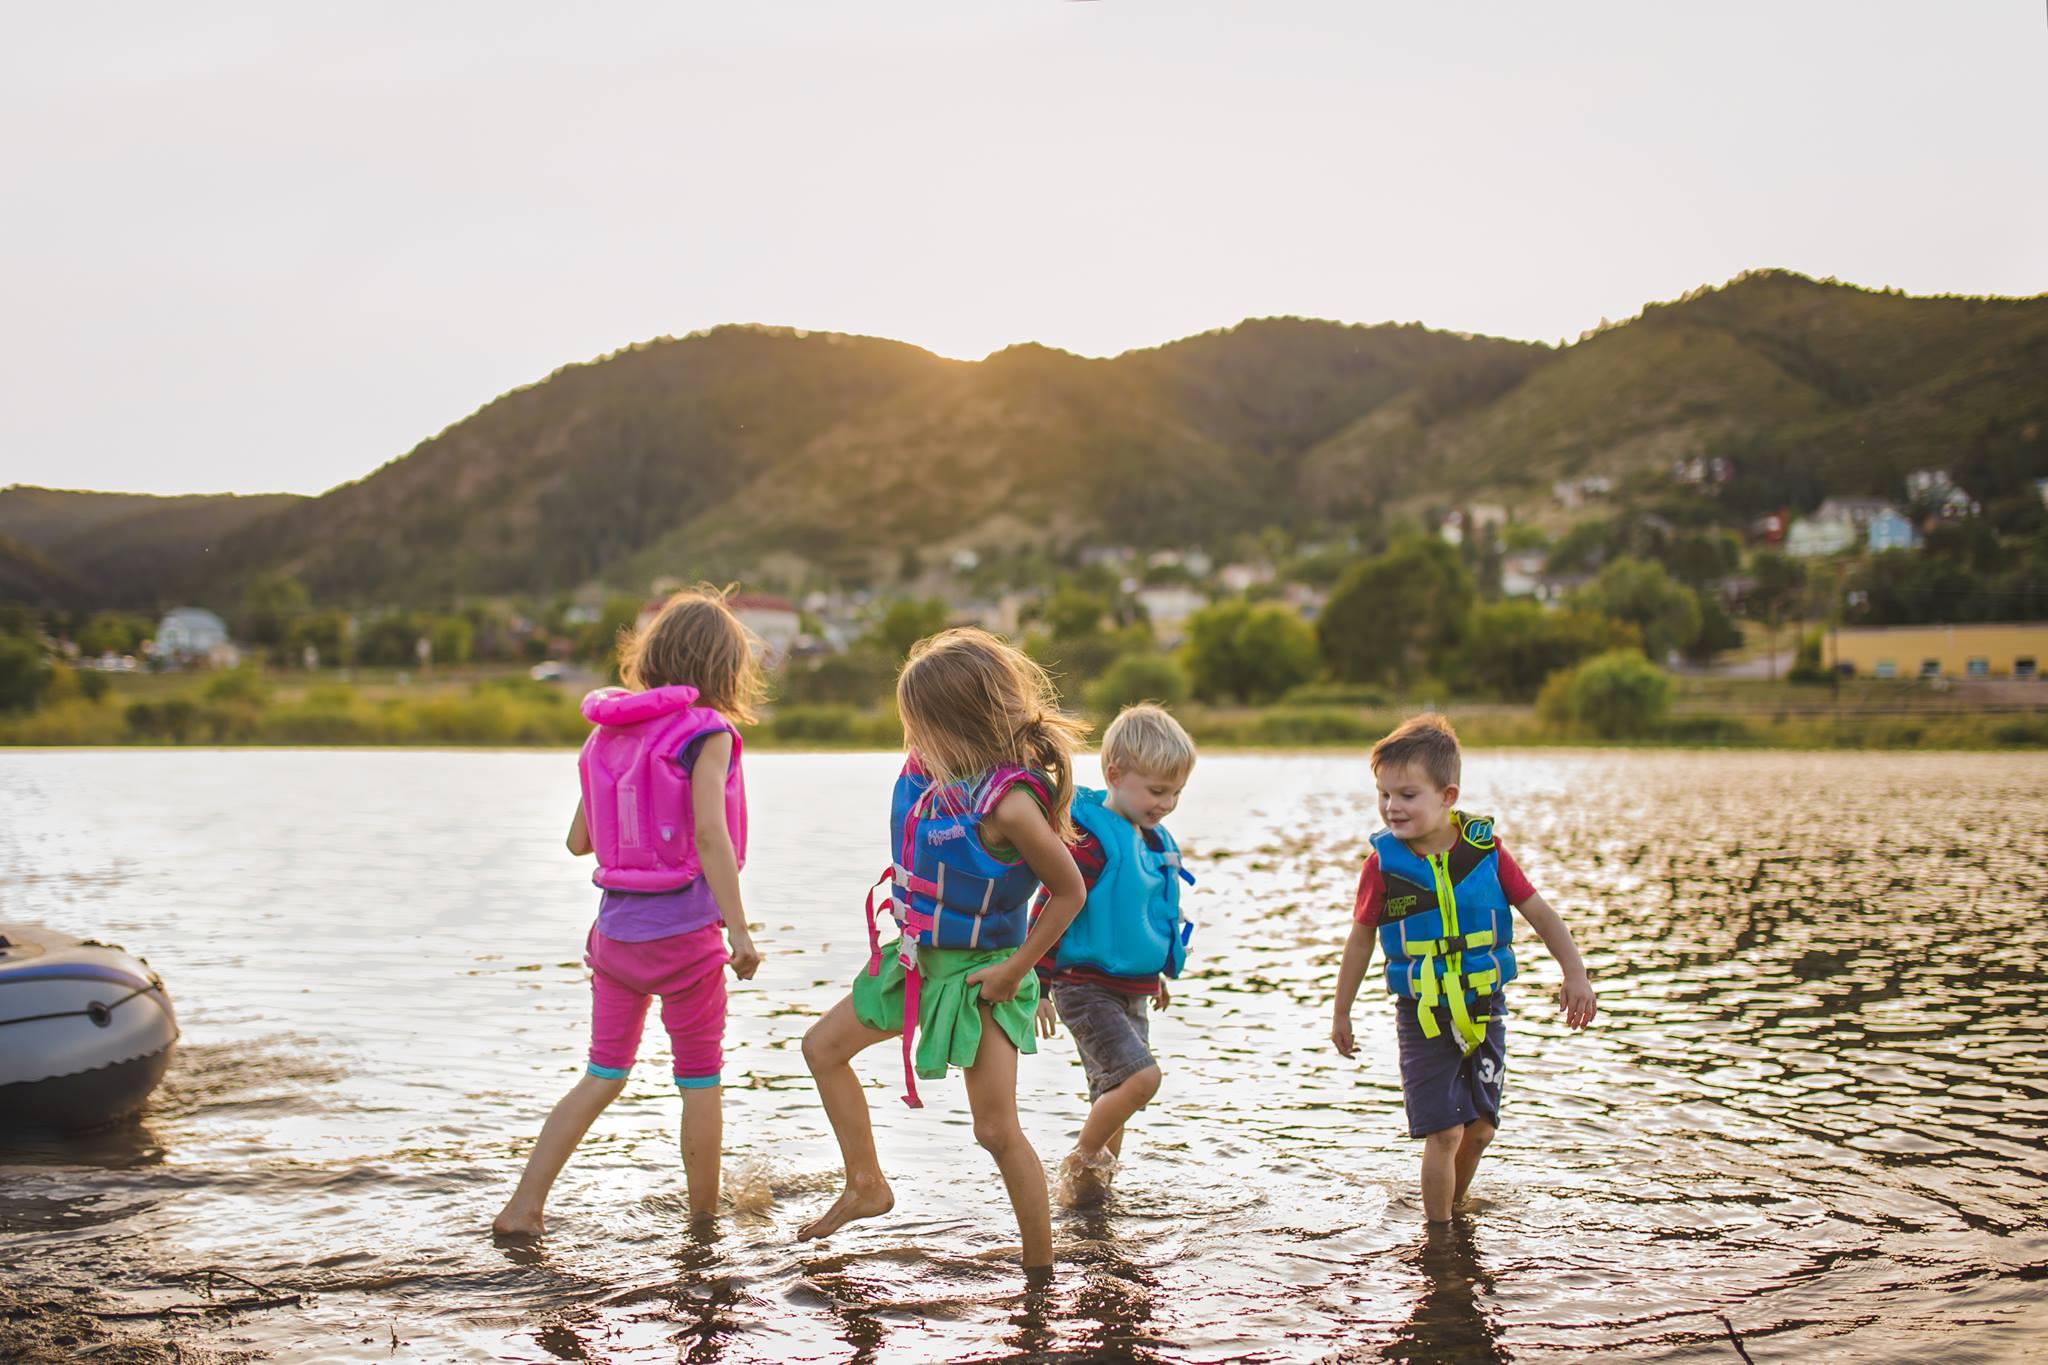 summer at the lake, the daily story